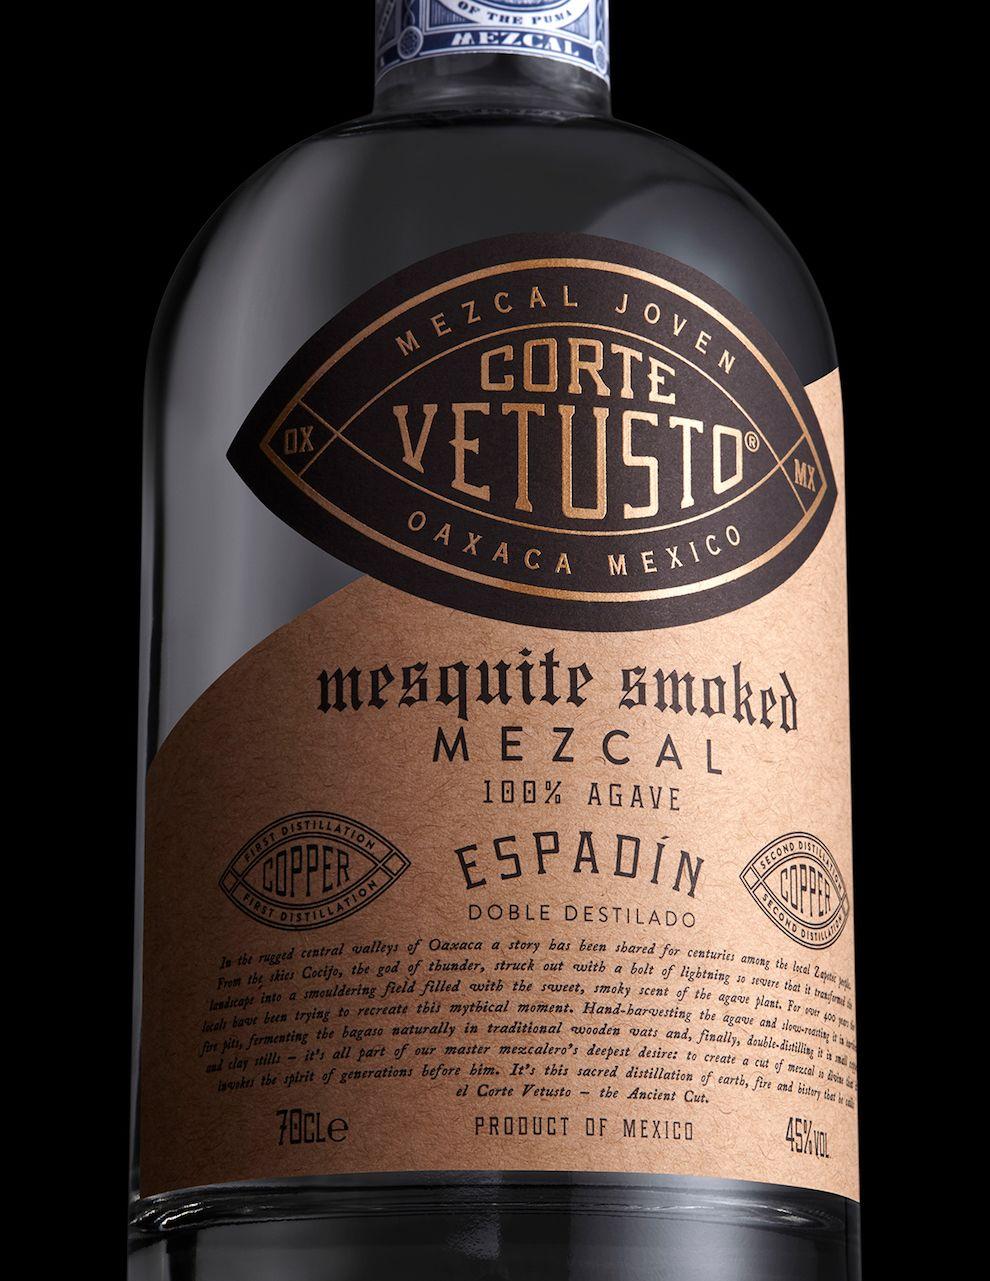 Corte Vetusto Package Design